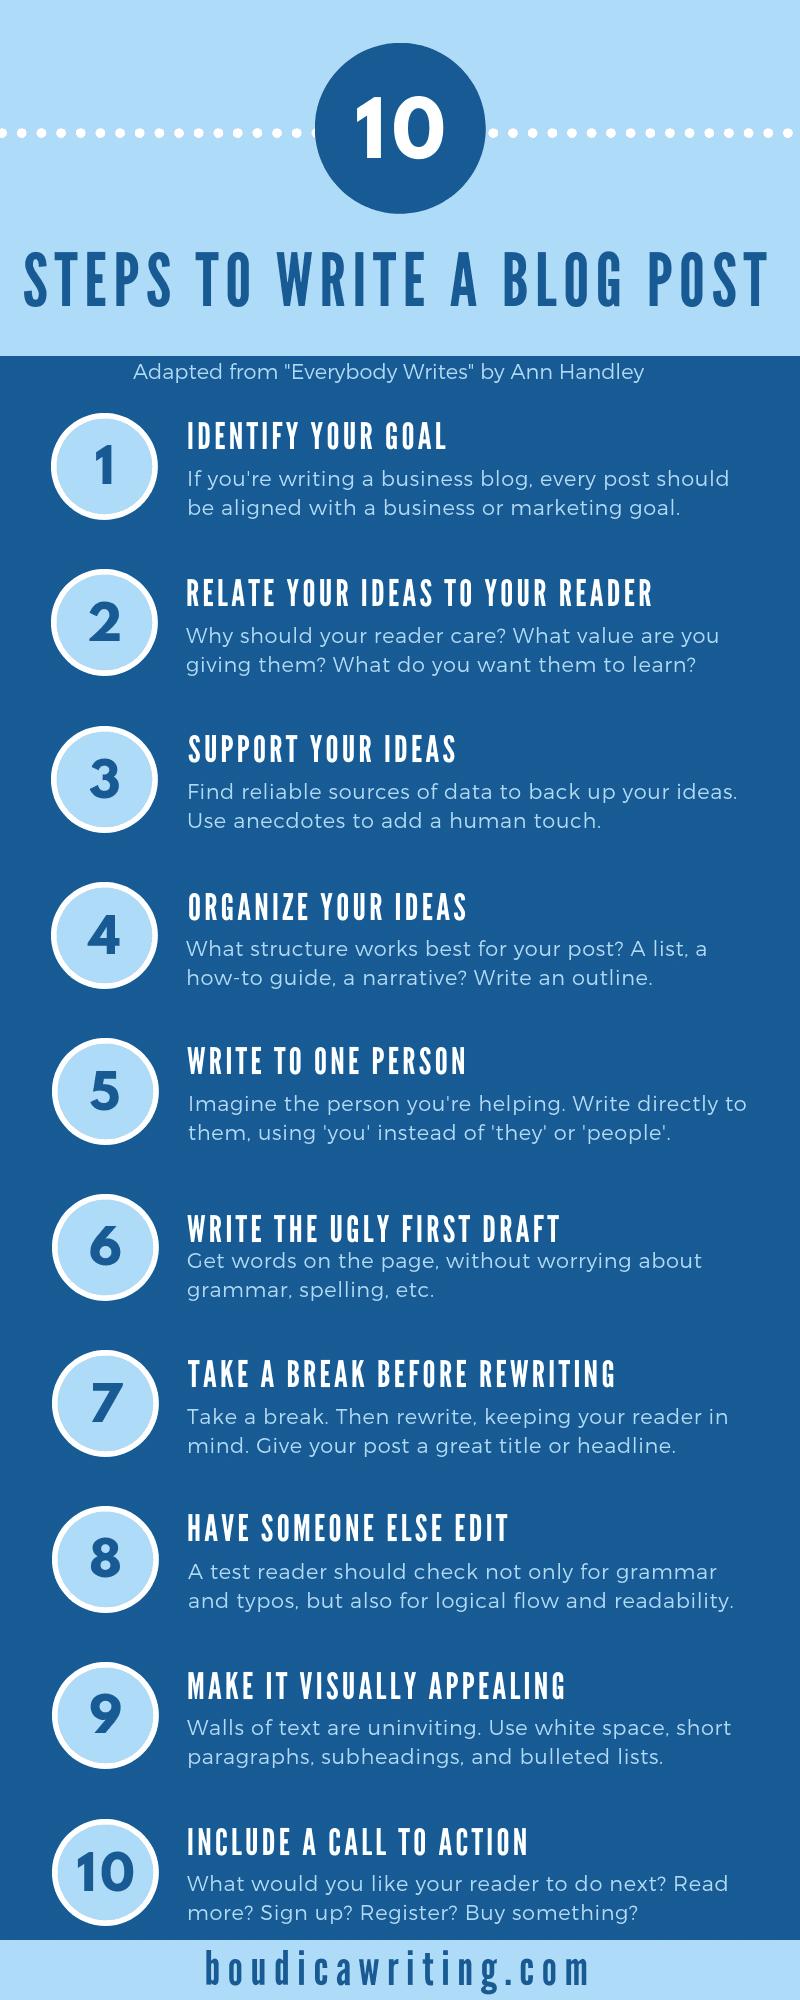 10-steps-to-write-a-blog-post-compressor.png